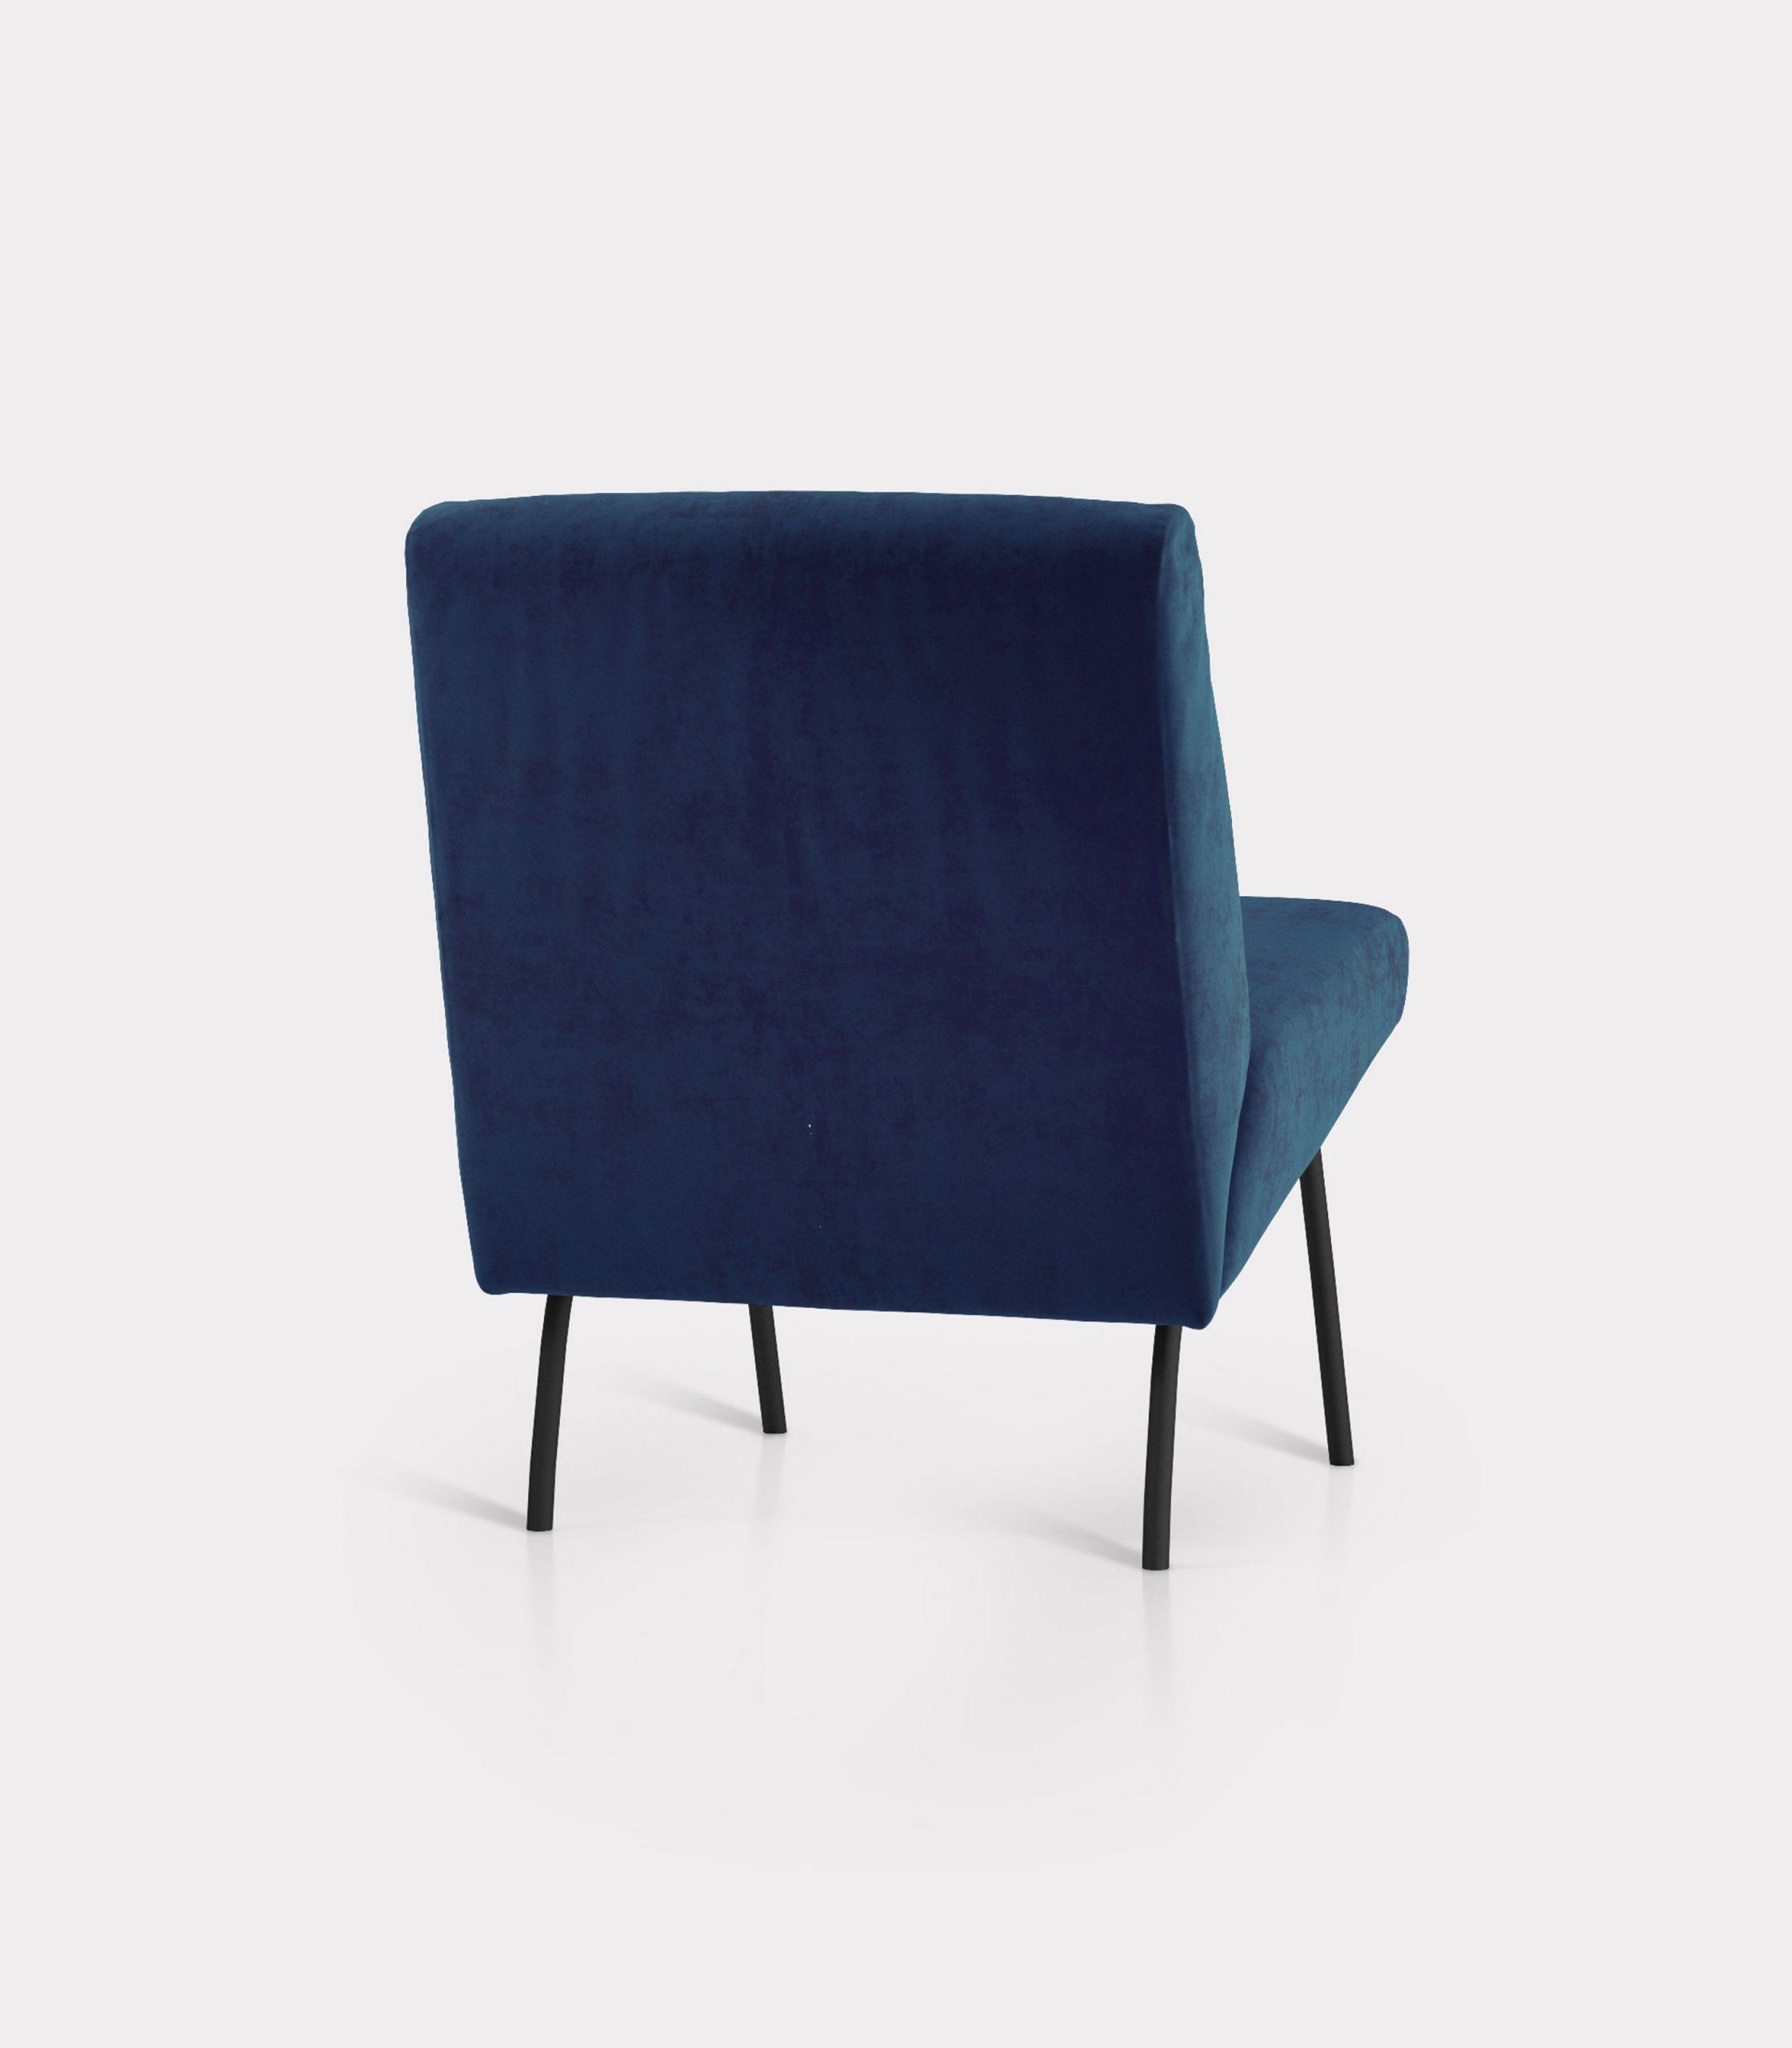 Blue armchair in velvet fabric loopo milan design R